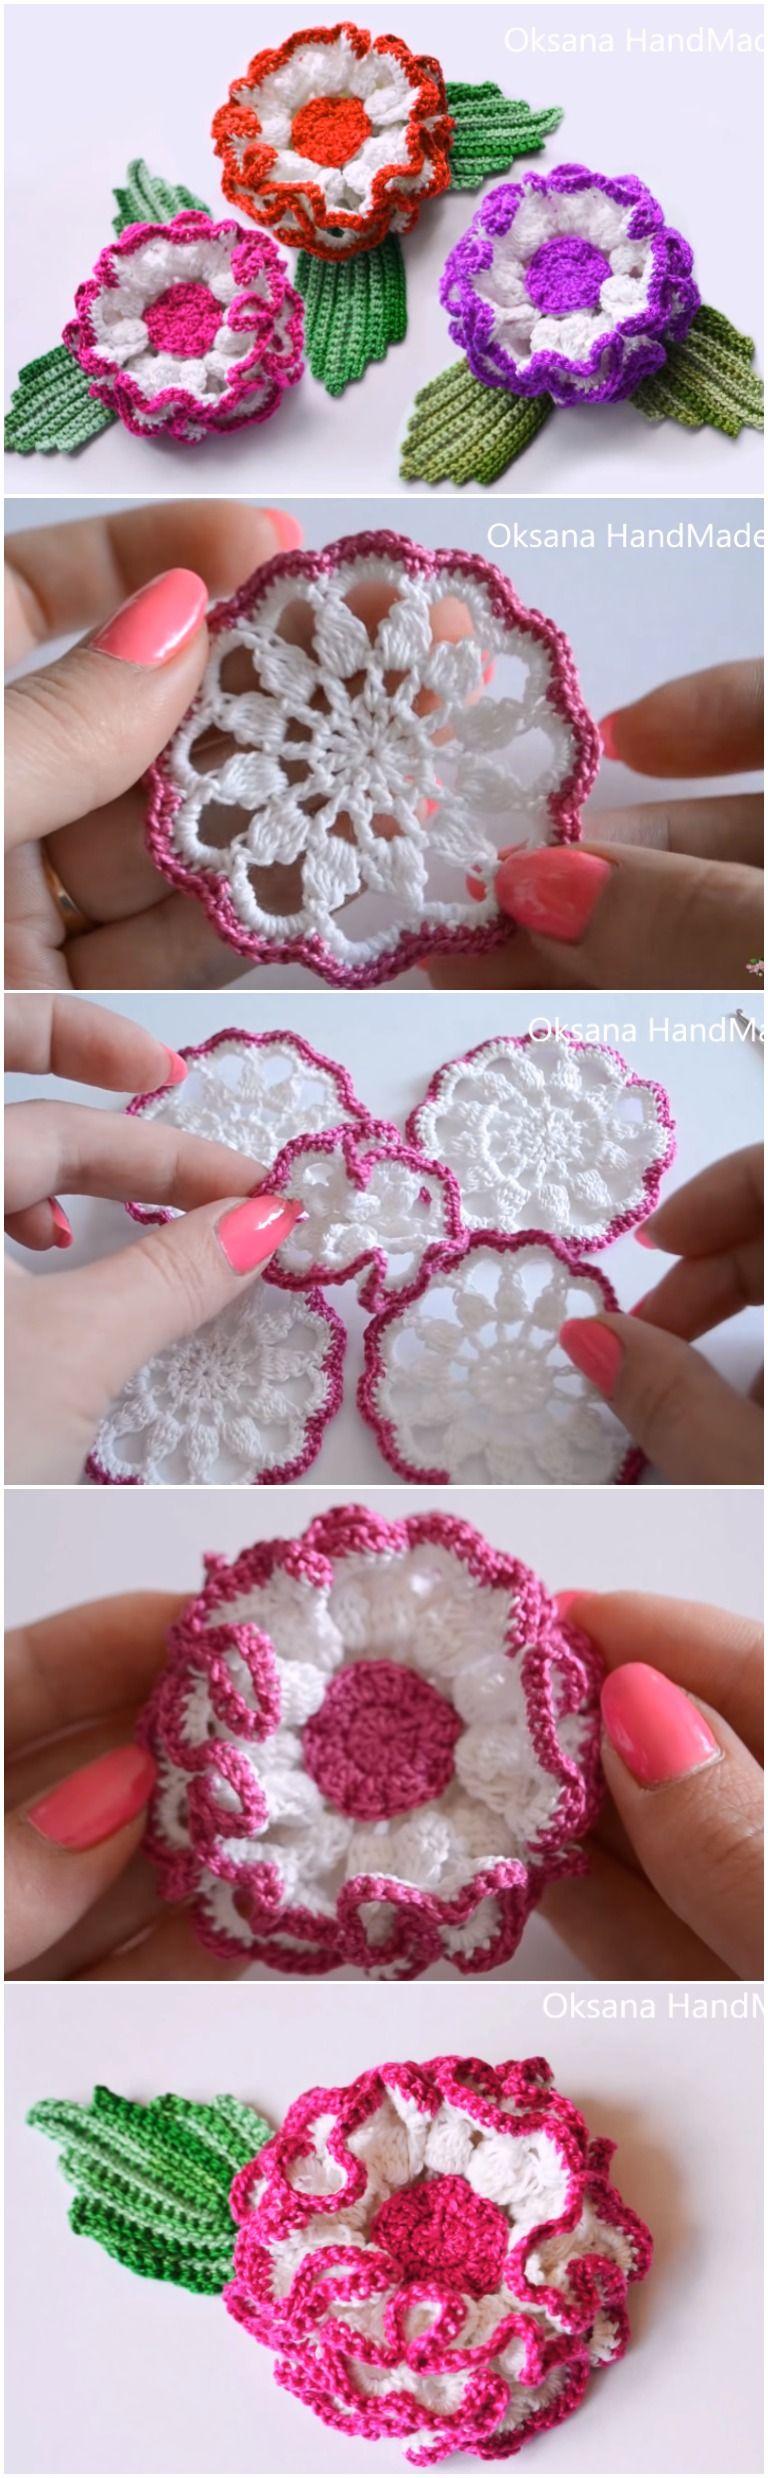 Crochet Daisy Flower Step By Step Crochet Daisy Crochet And Flower